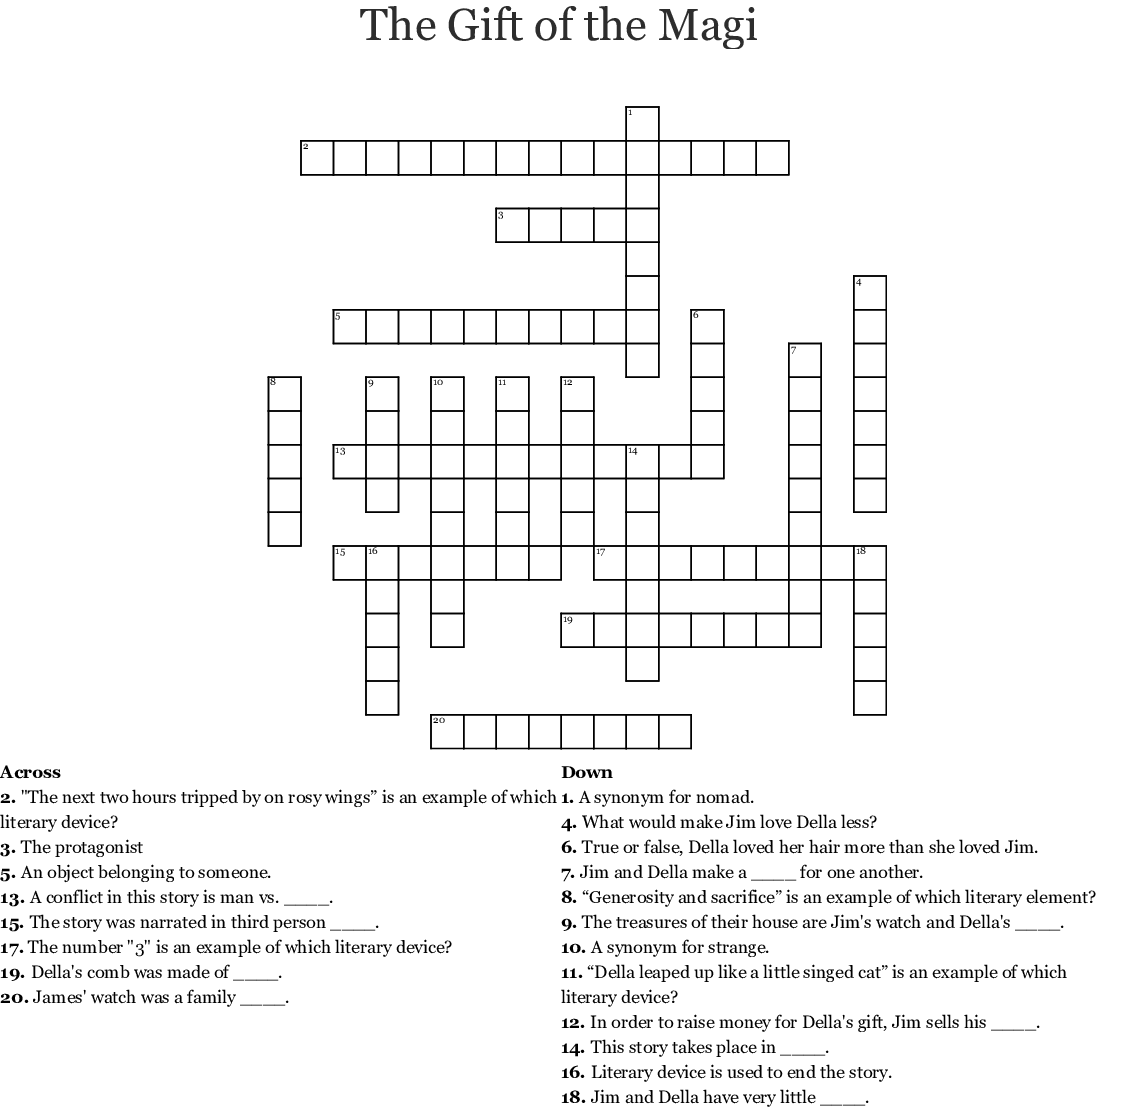 The T Of The Magi Crossword